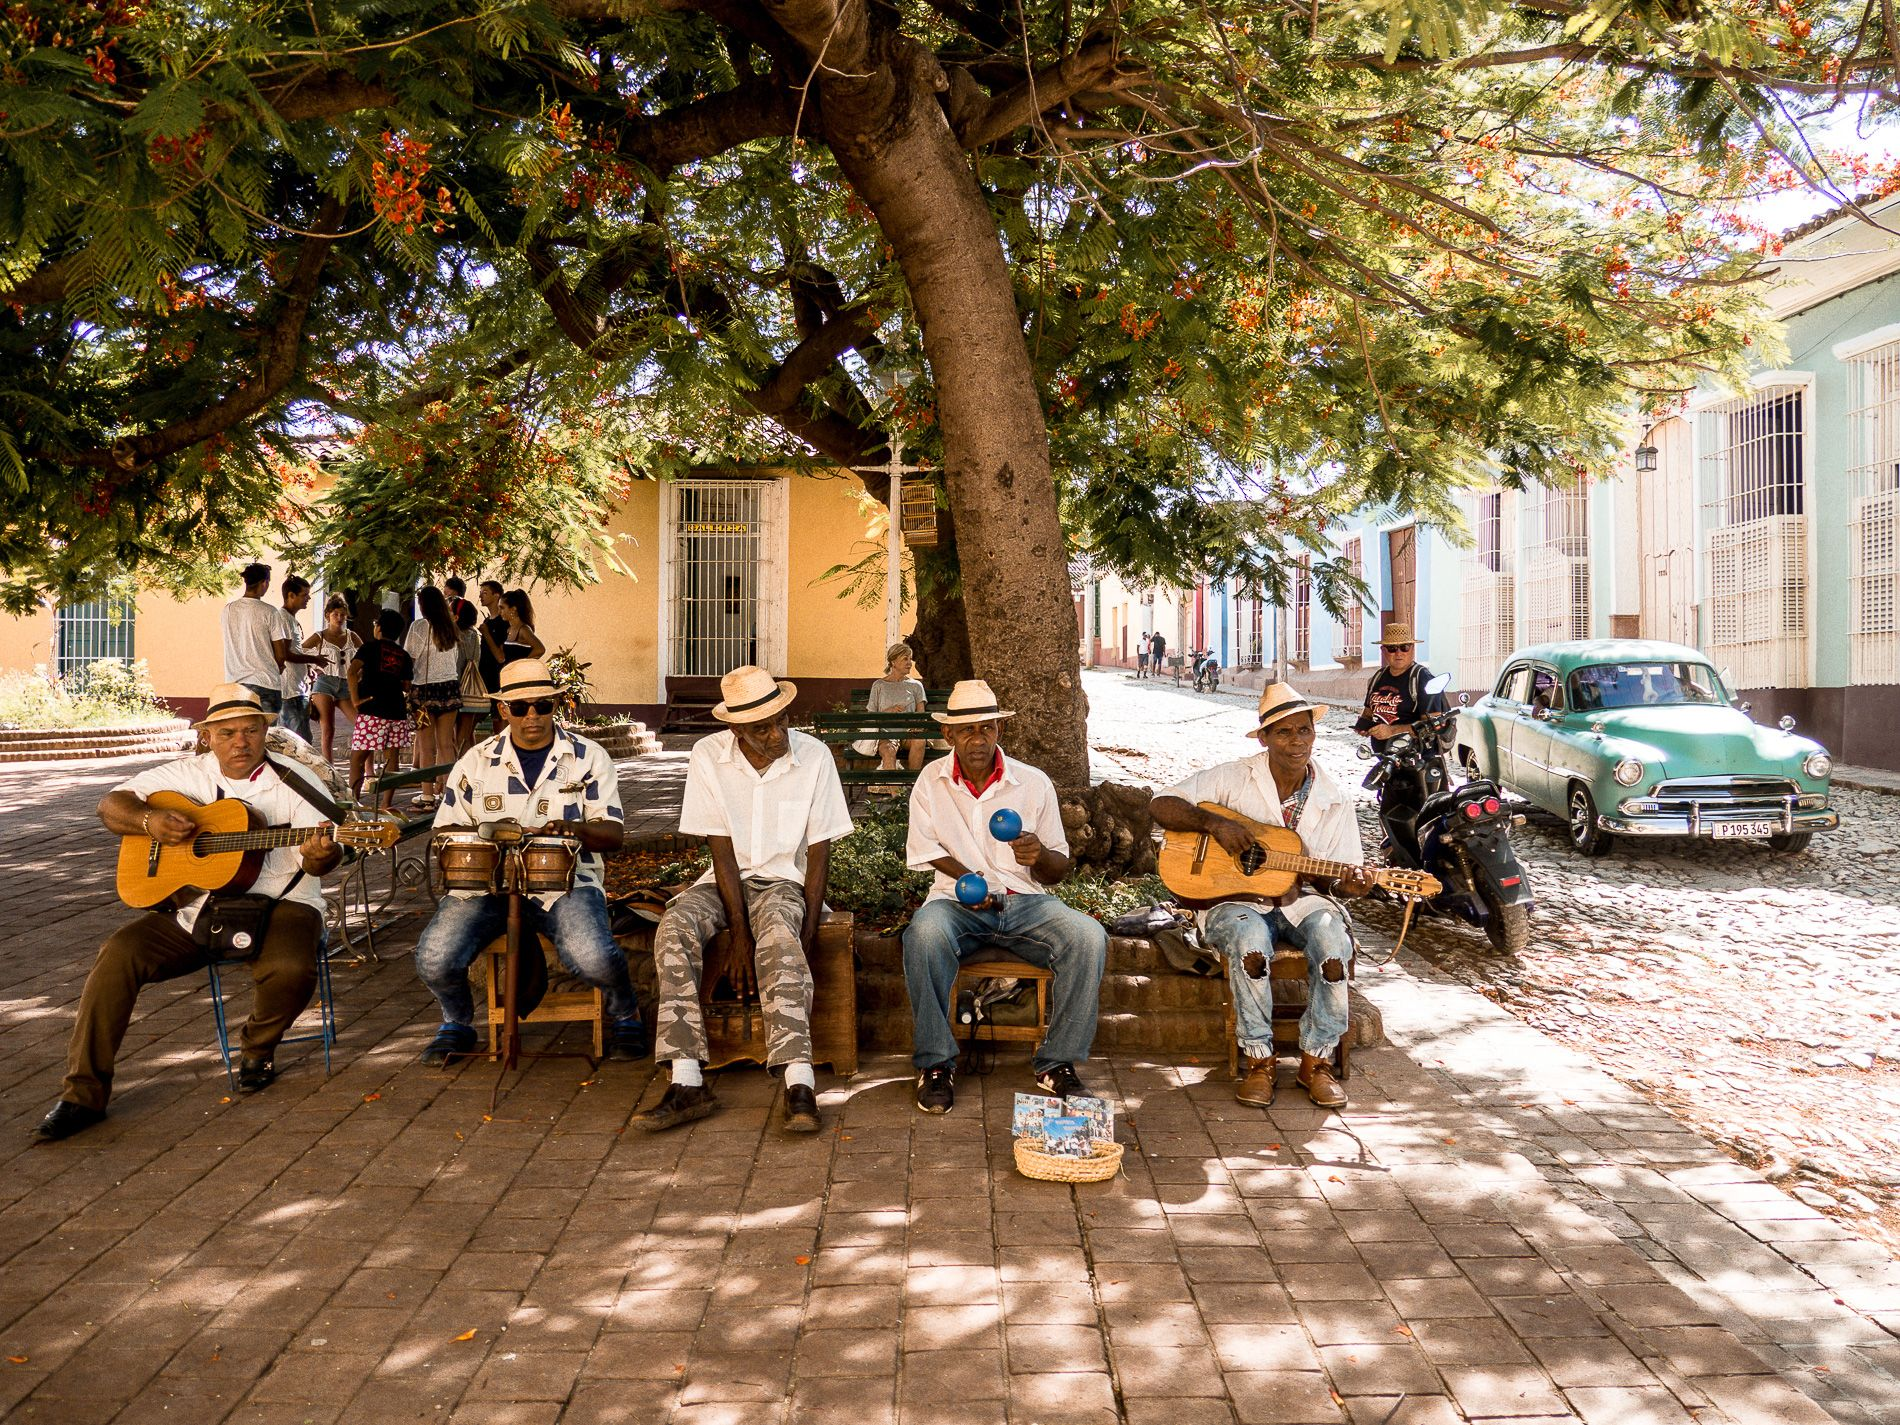 Cuba | Trinidad | Musique cubaine | conseils | voyage